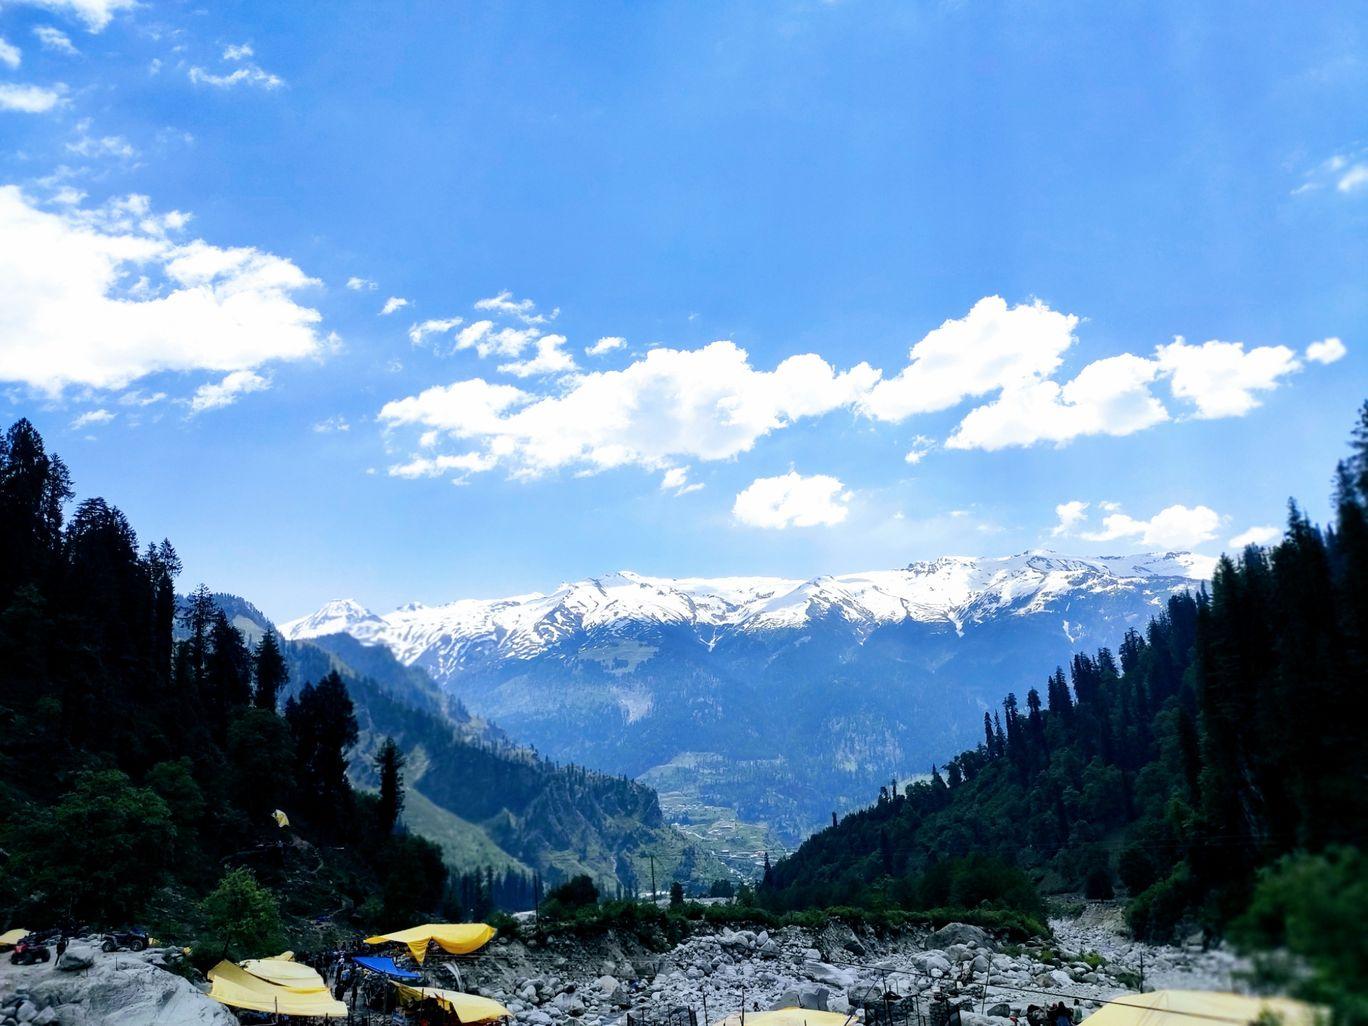 Photo of Manali By Anujj Laroiya